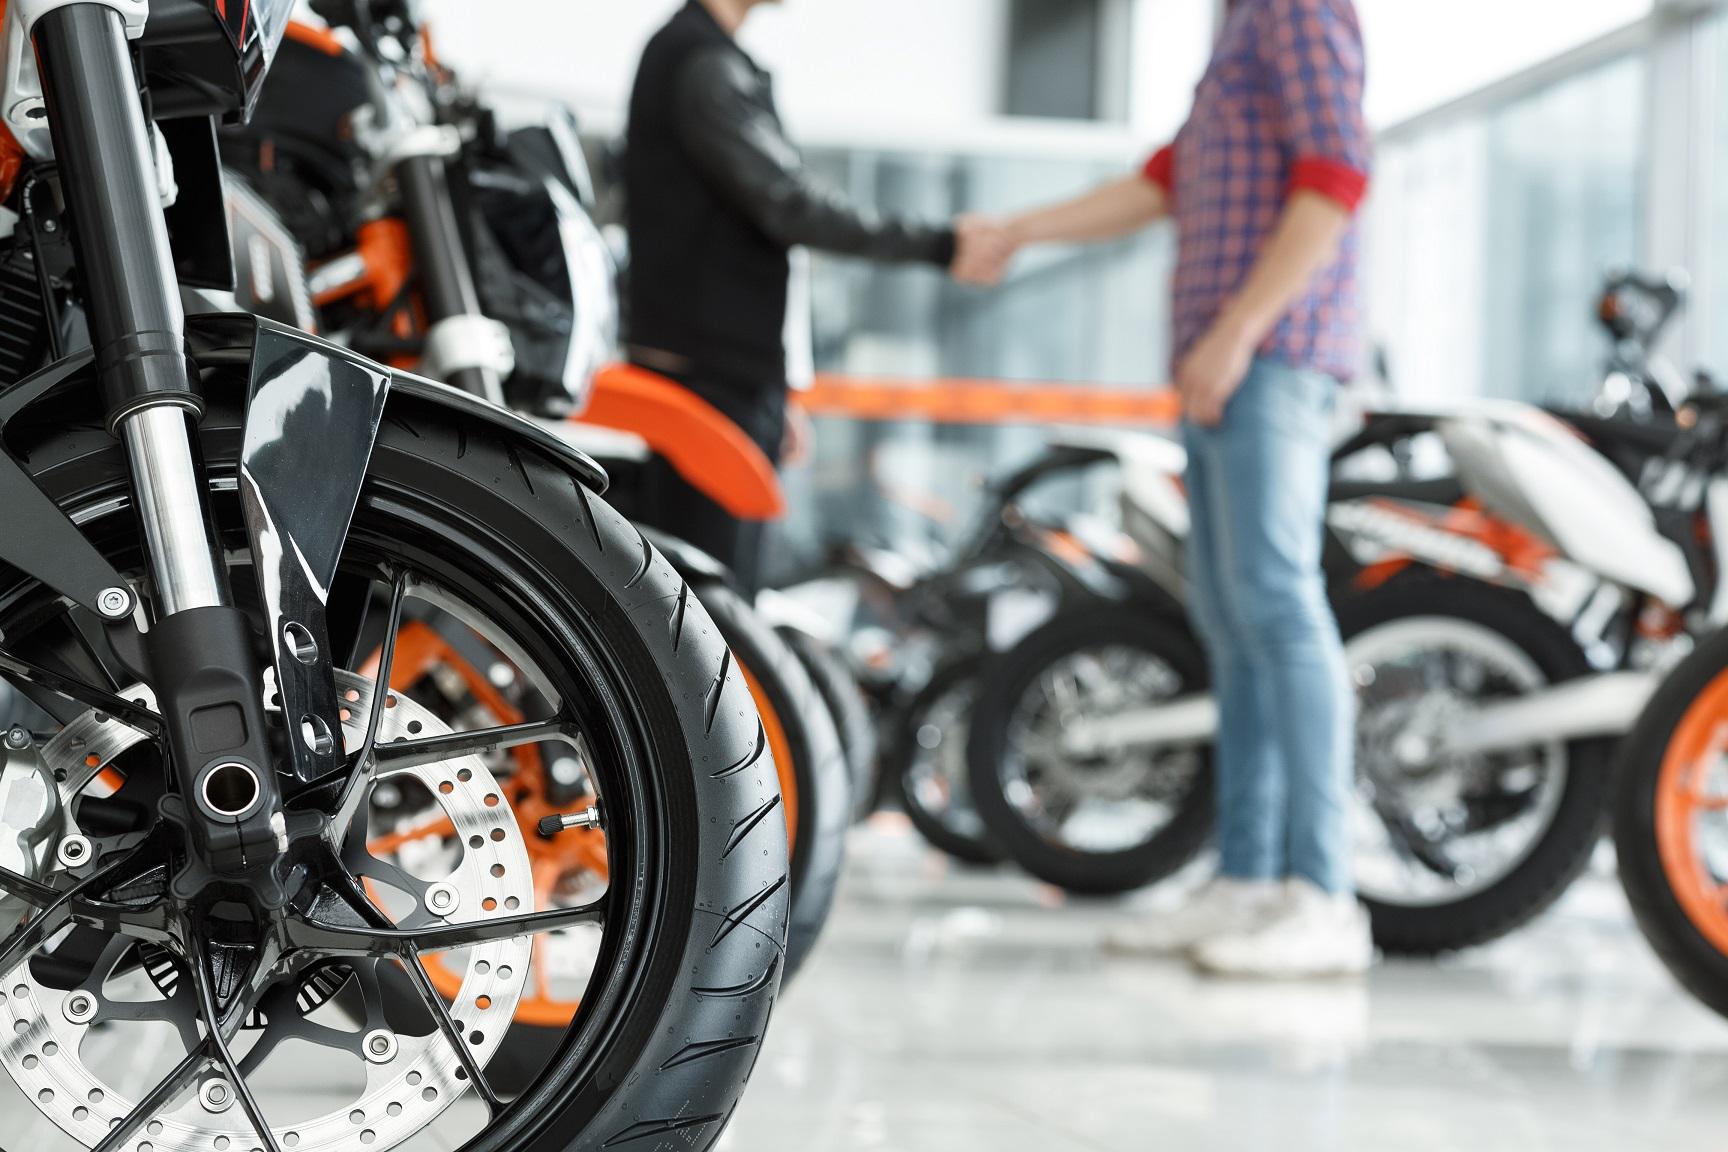 Госпошлина за перерегистрацию мотоцикла